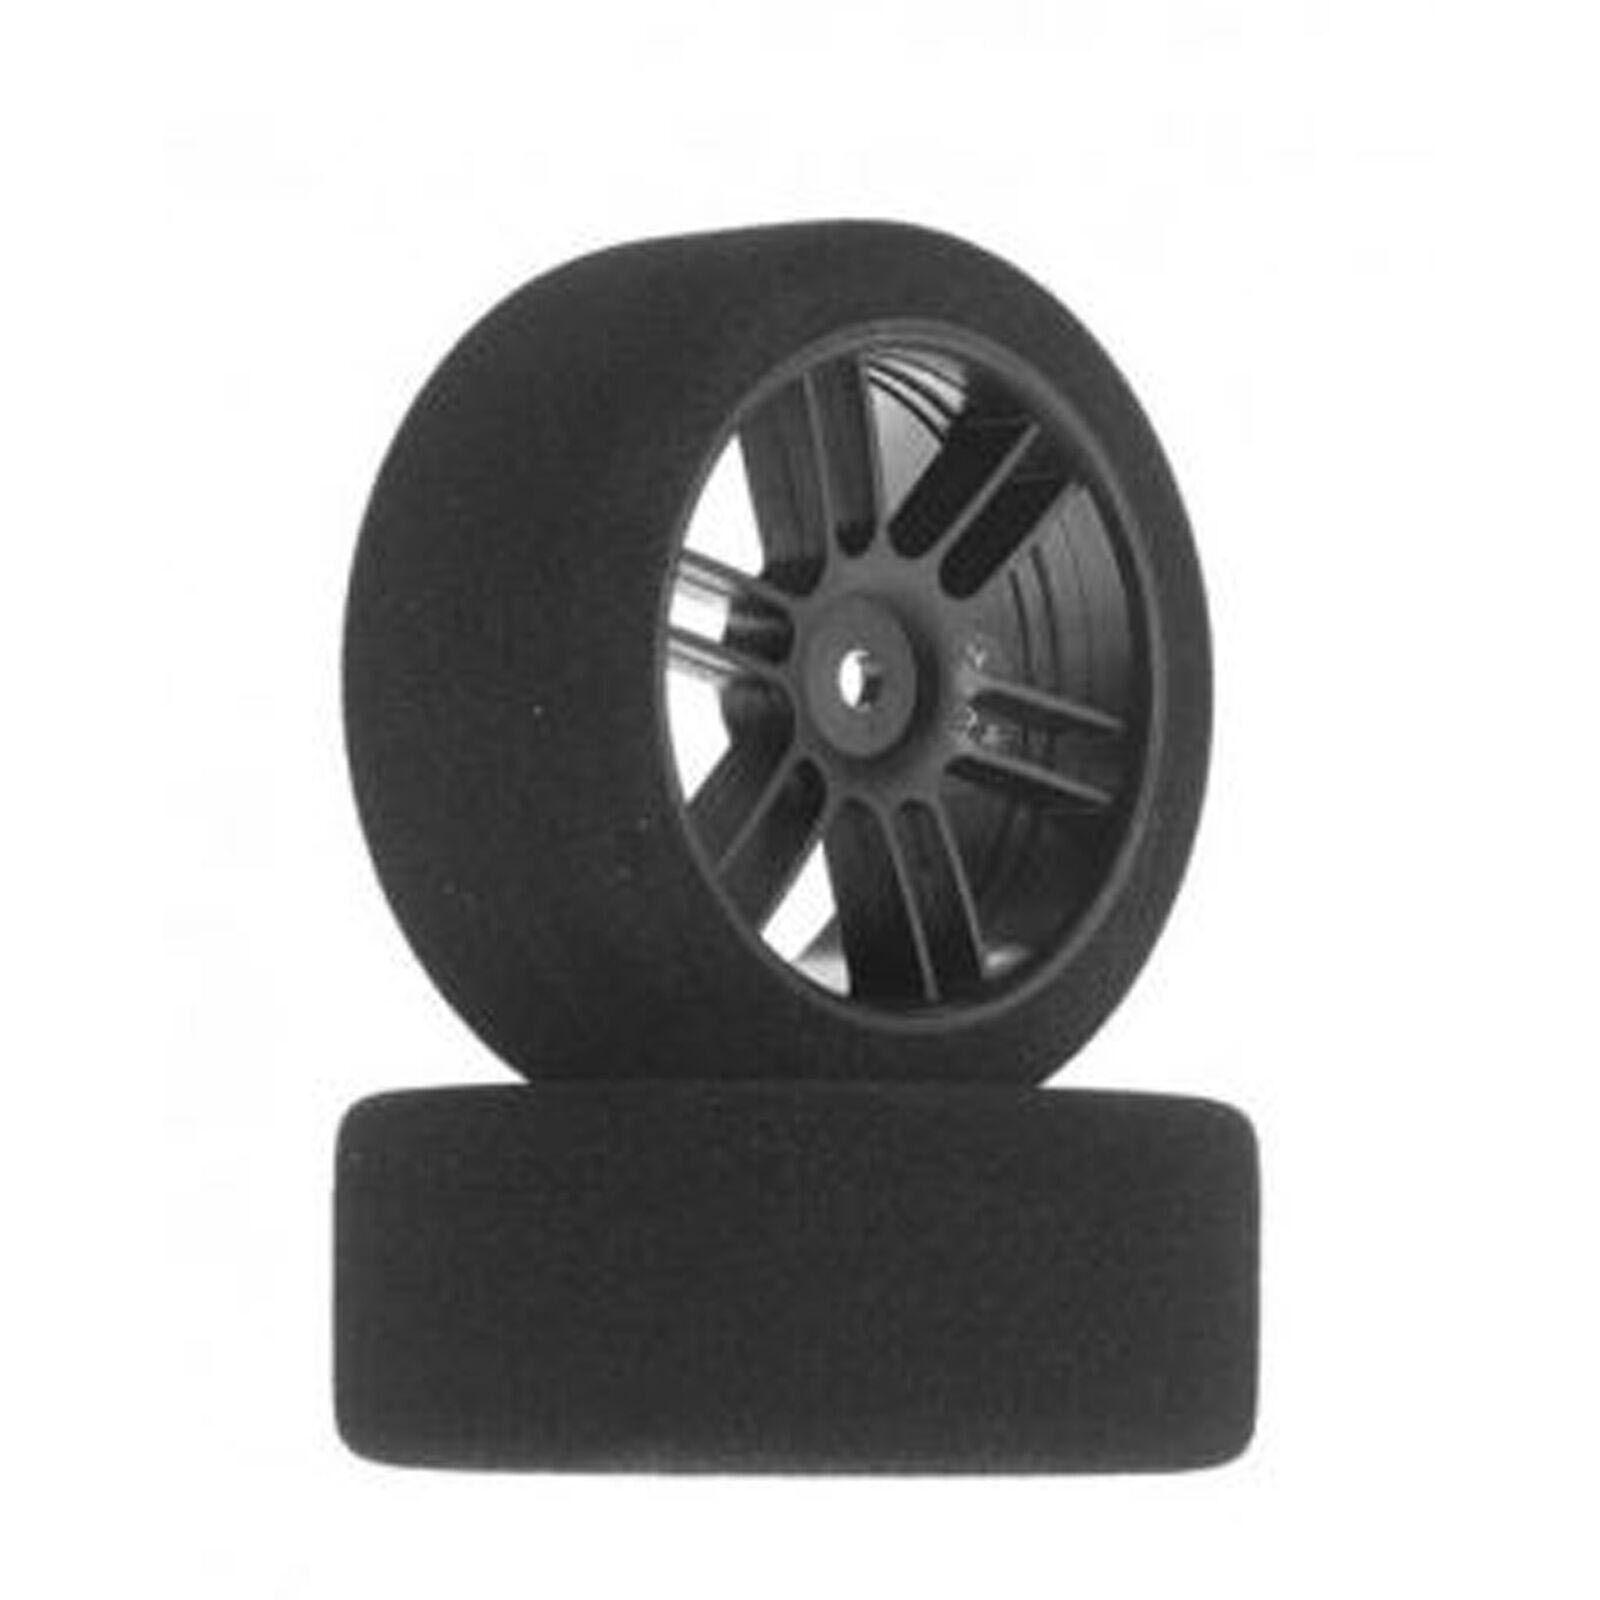 1/10 26mm Nitro Touring Foam Tires, Mounted, 35 Front, Black Wheels (2)